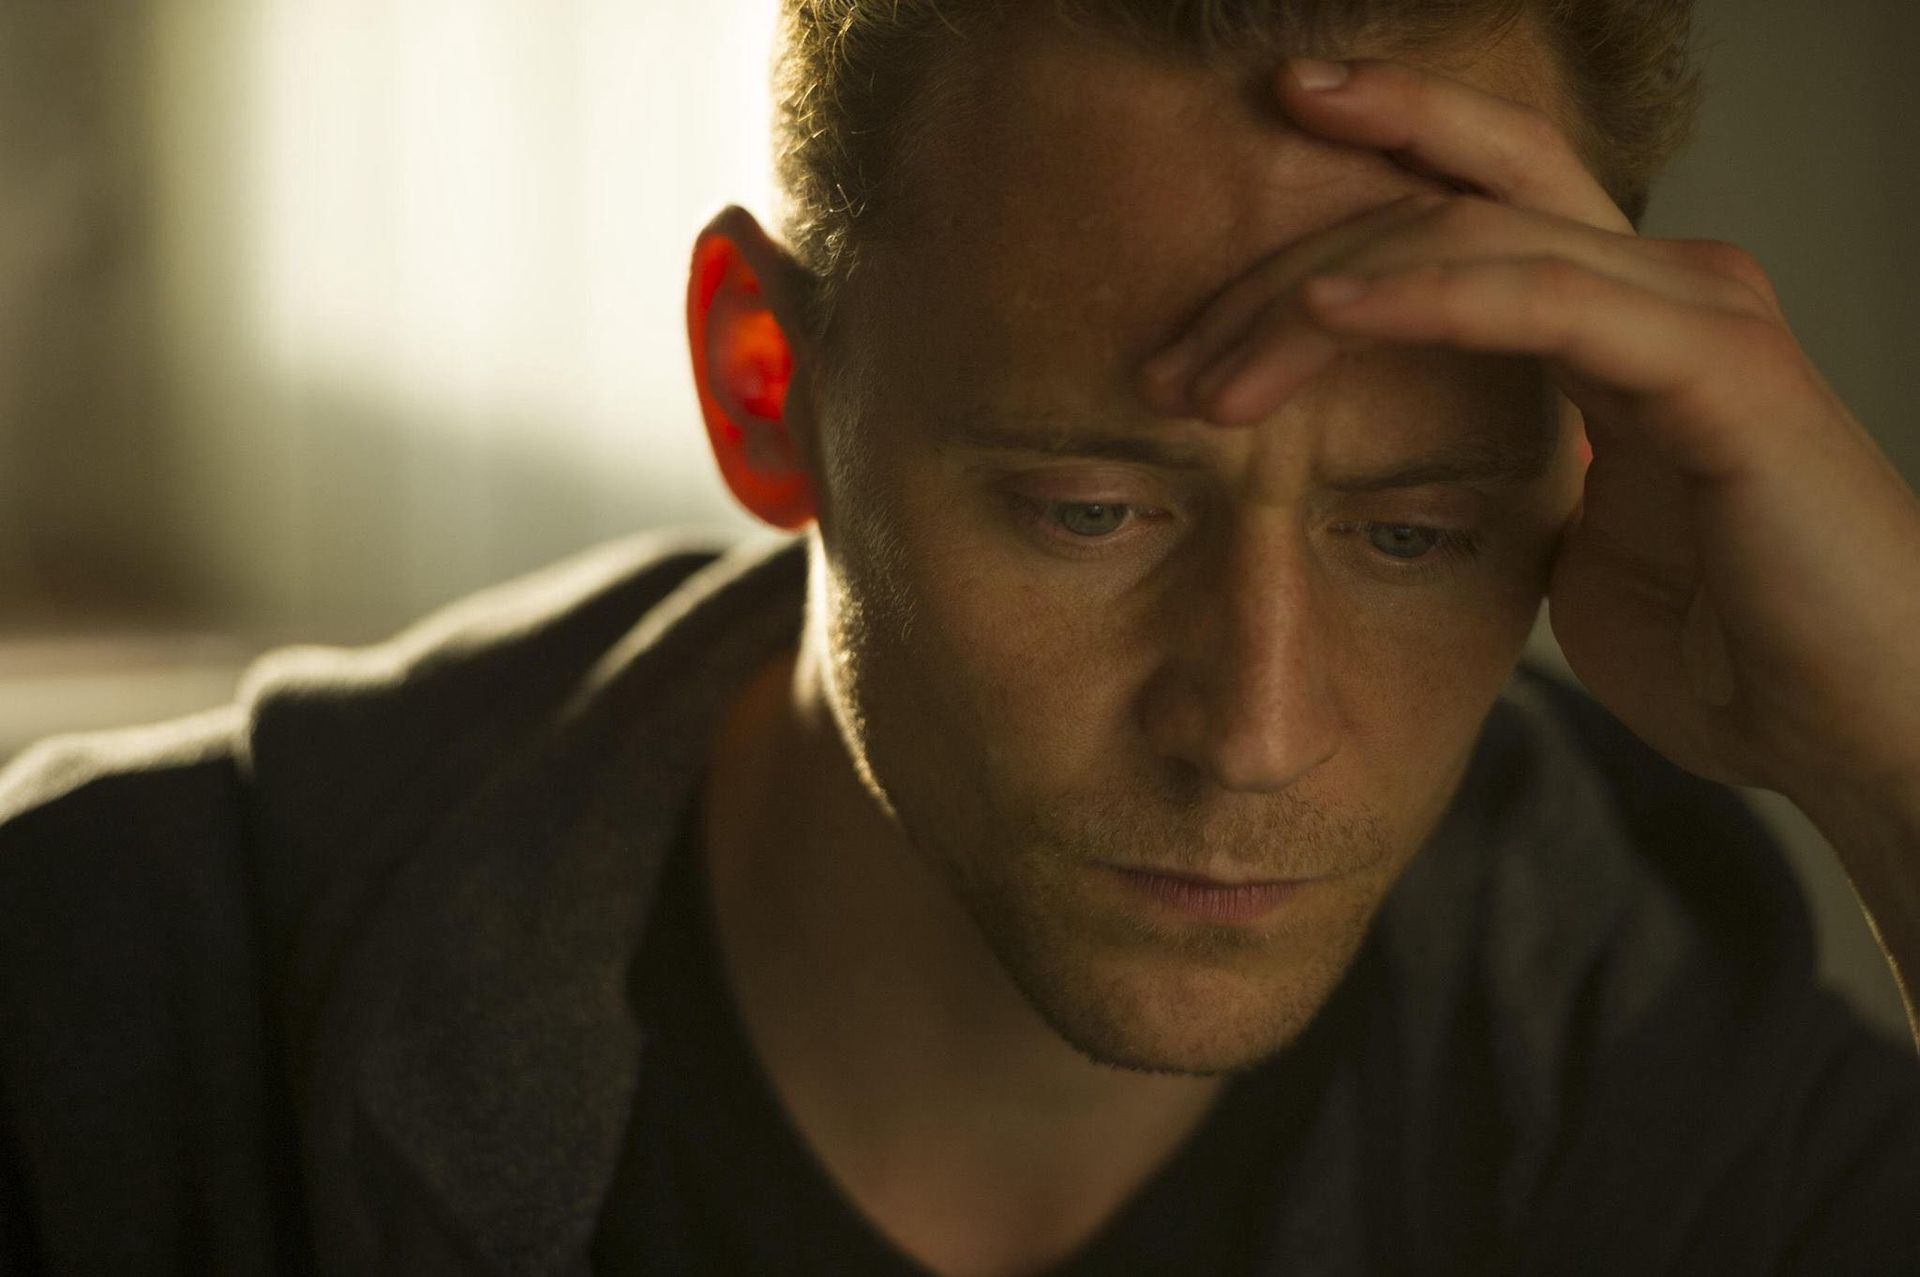 Unspoken Feelings [Tom Hiddleston X Reader] - Part VII - Wattpad